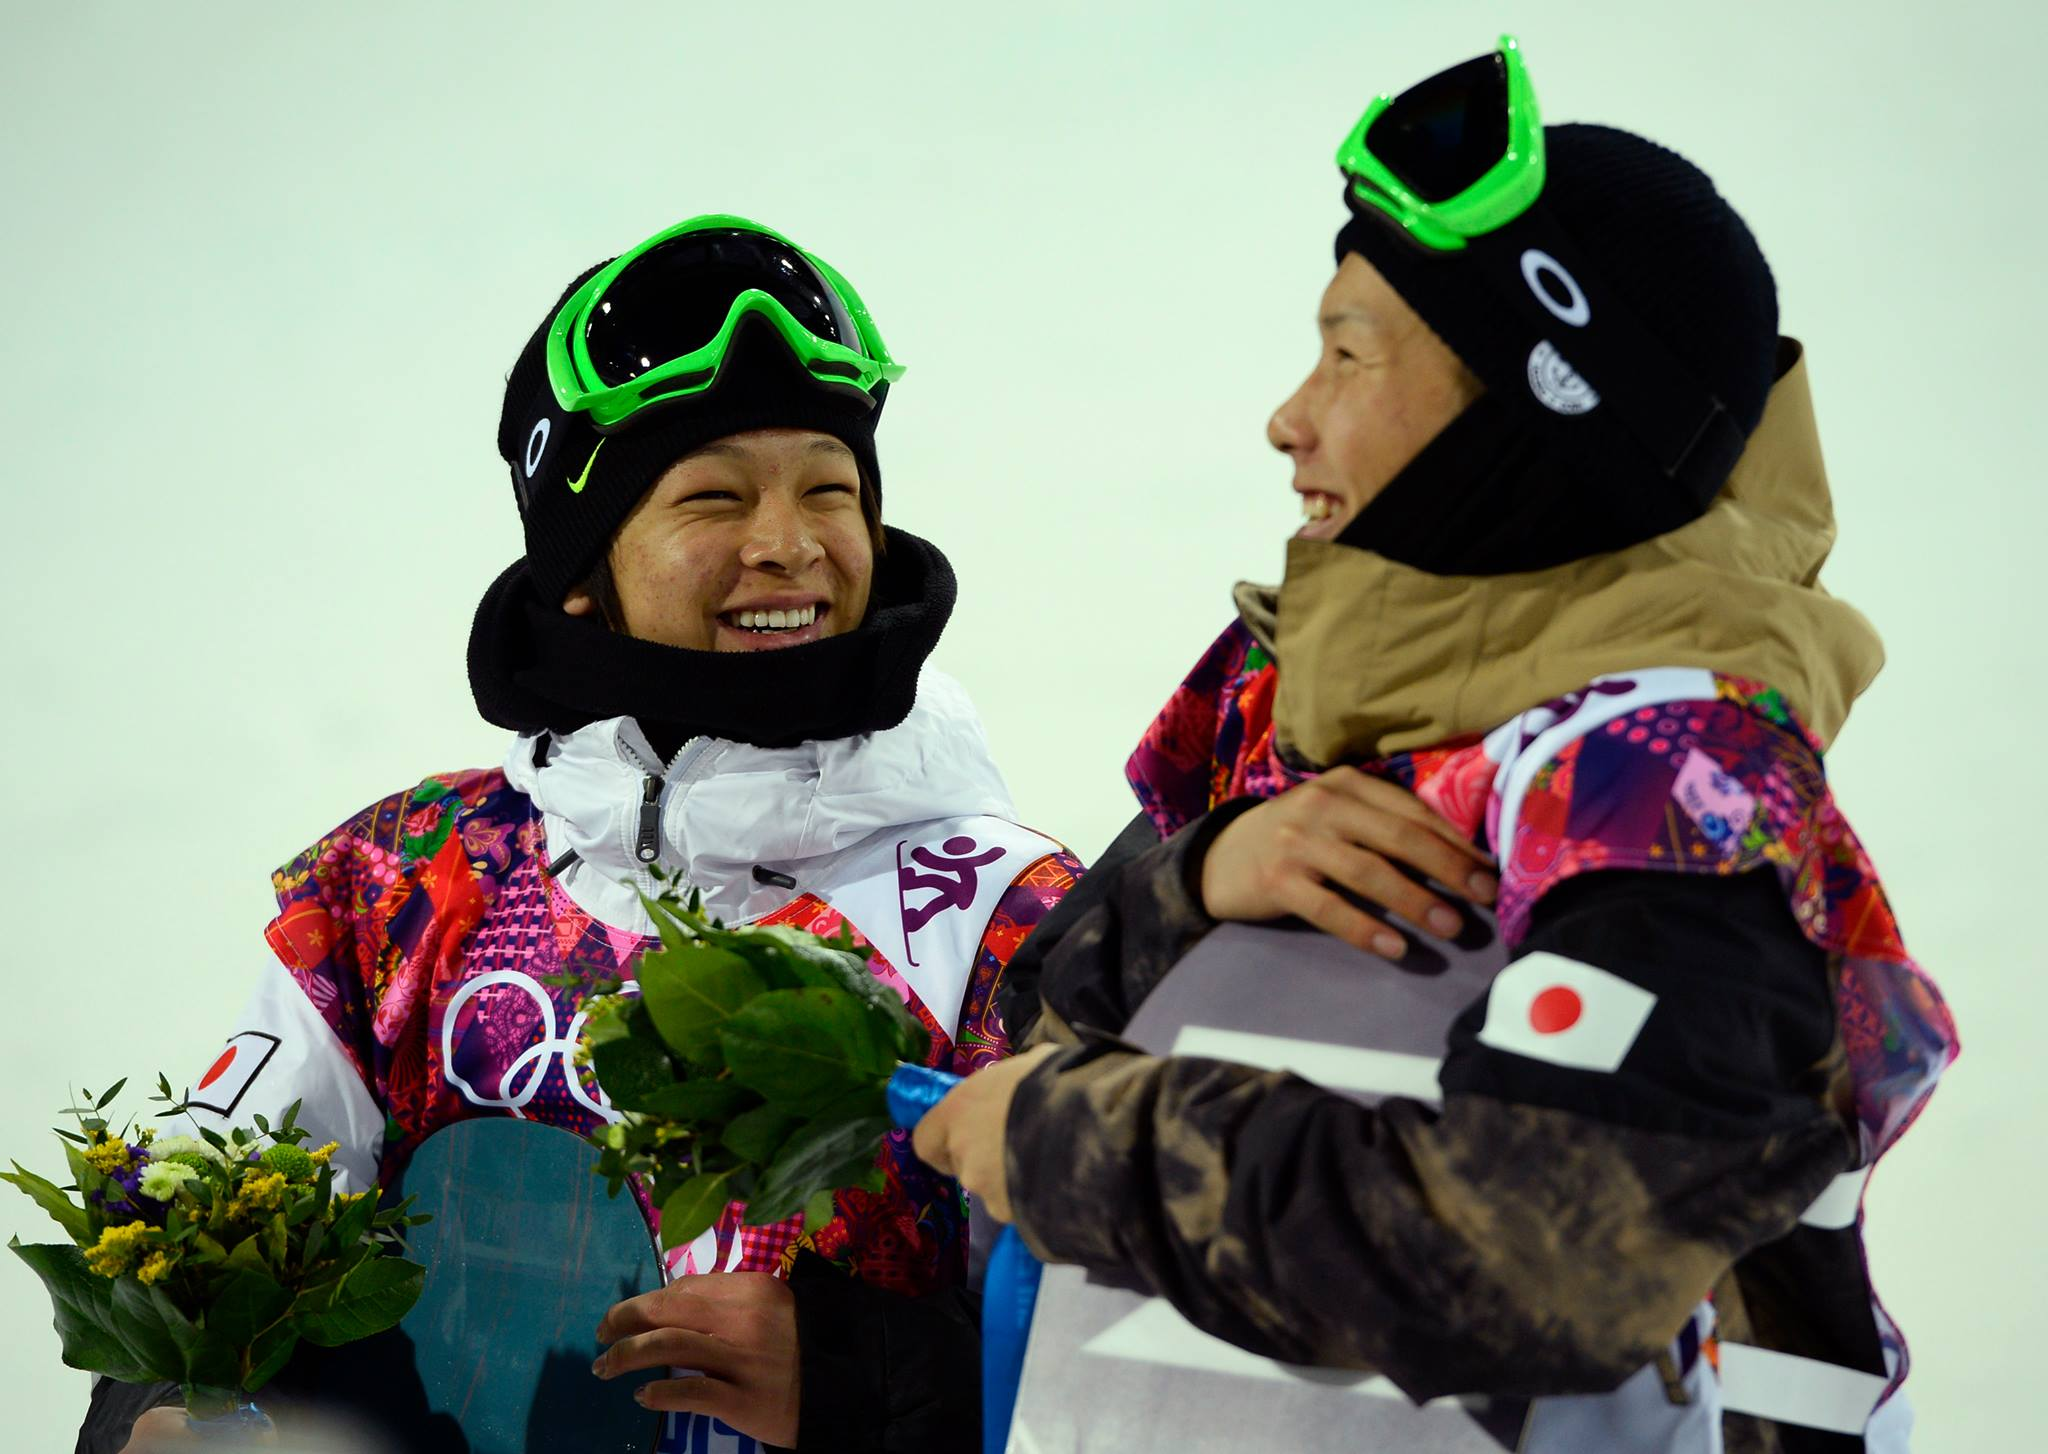 Sochi 2014 Olympics snowboard_e0115904_8362629.jpg